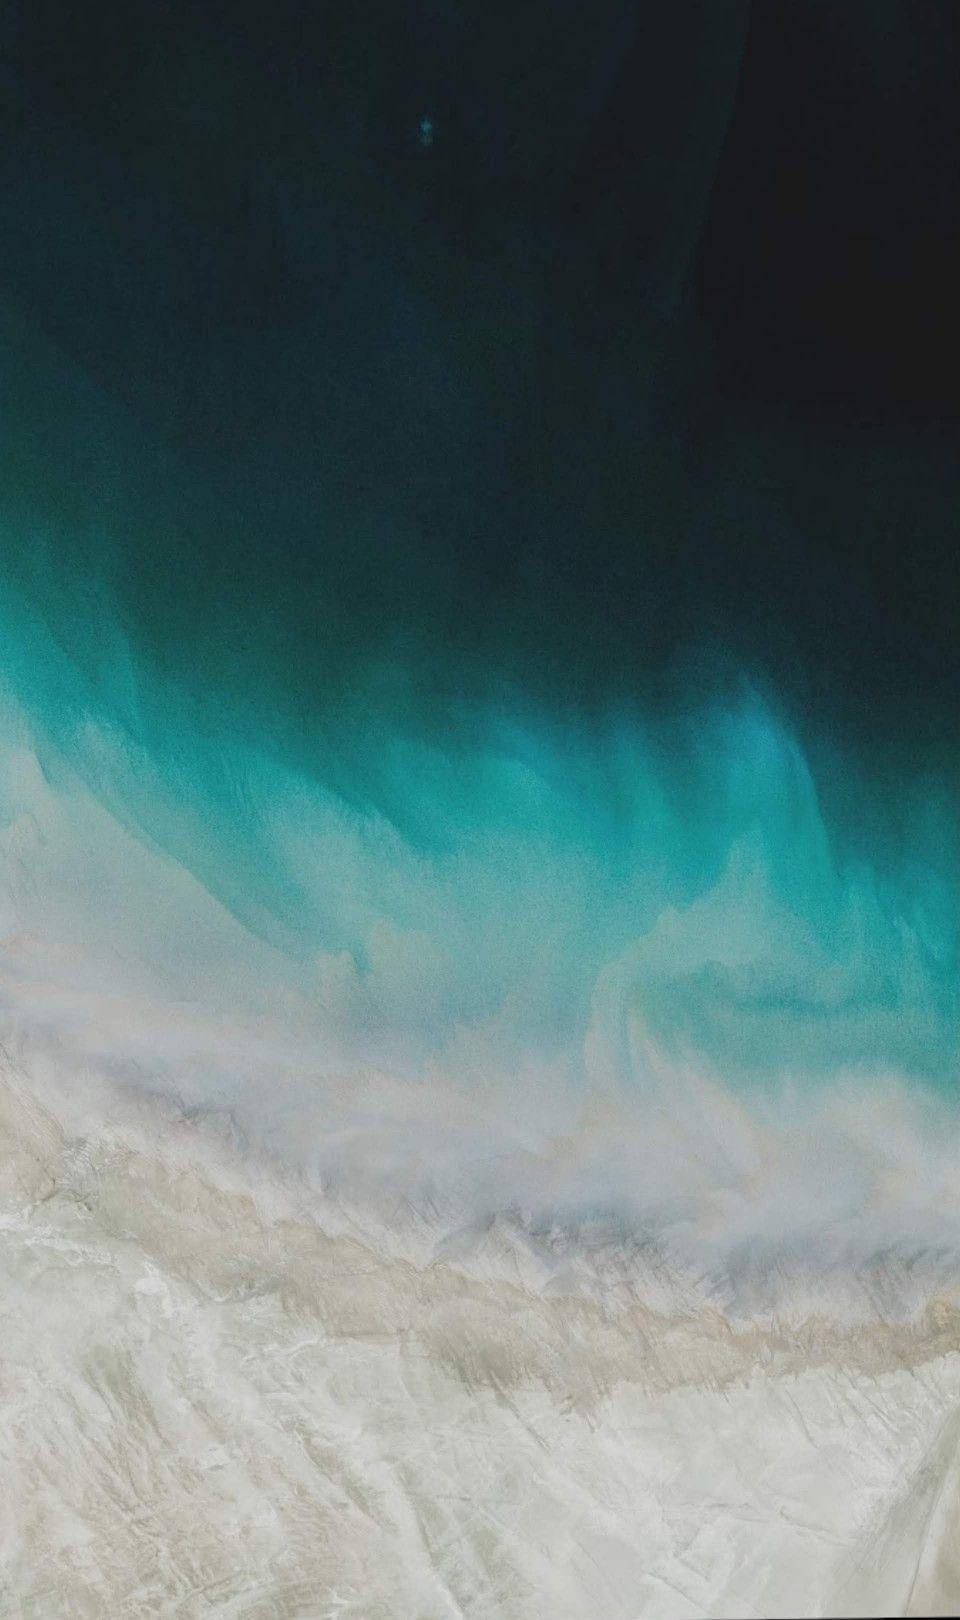 Samsung Chromebook Wallpaper Abstract Art Galaxy cool chromebook wallpapers